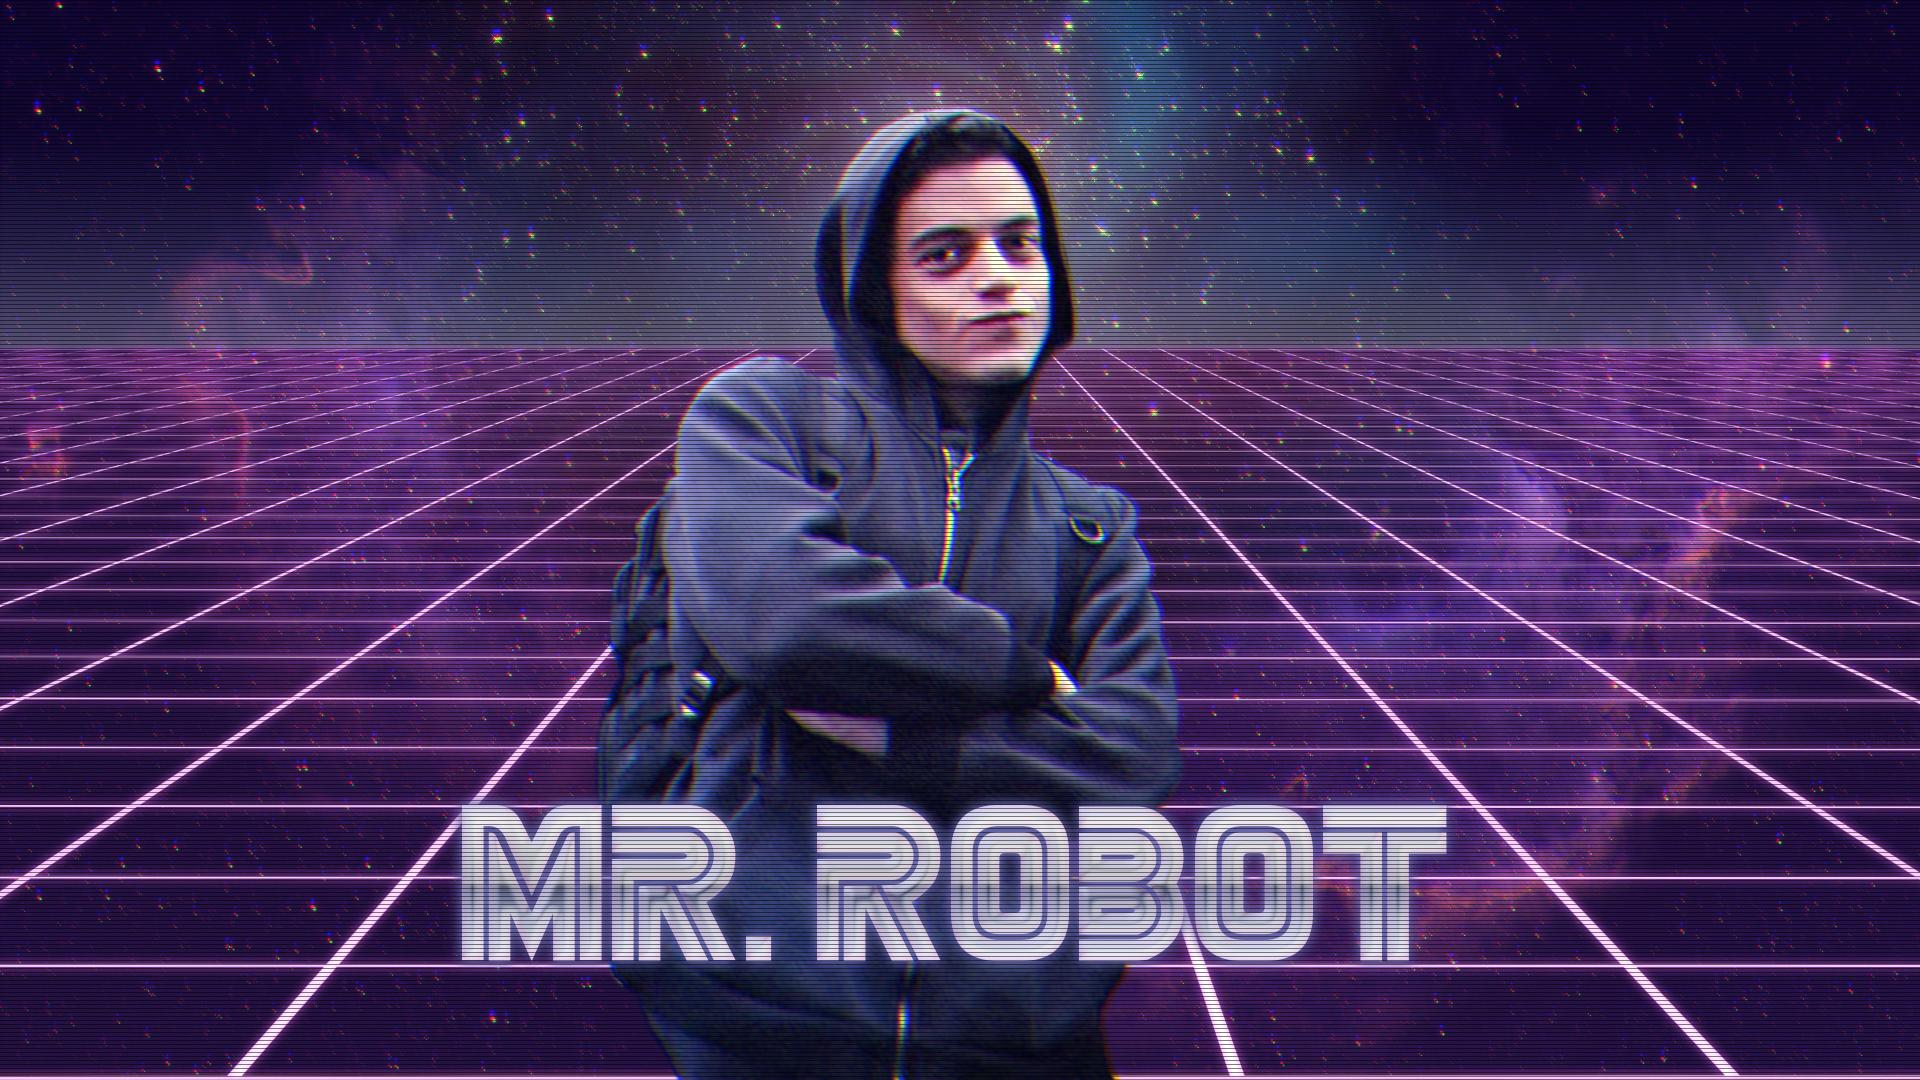 Mr. Robot Wallpapers